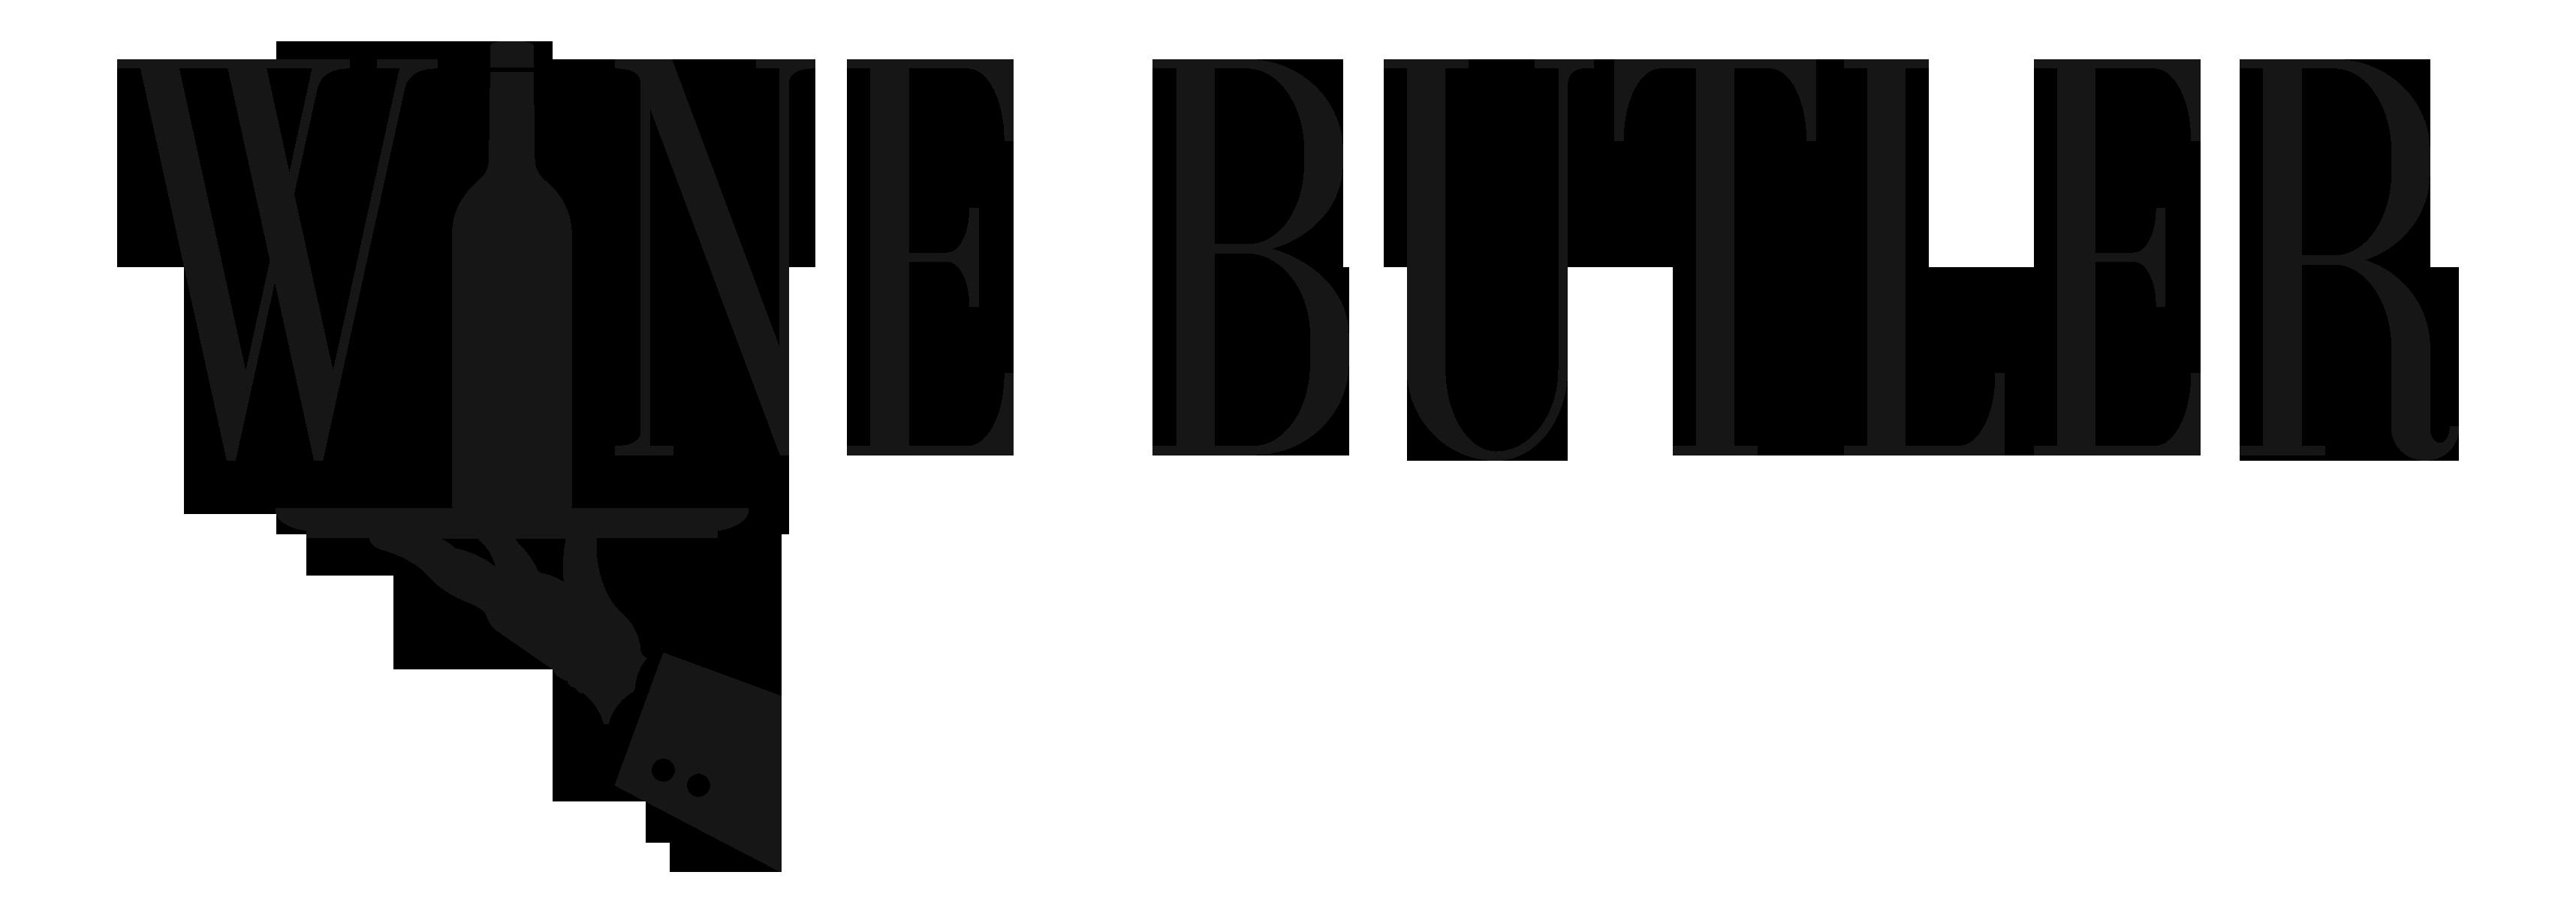 Create a logo for an award winning winemaking company.